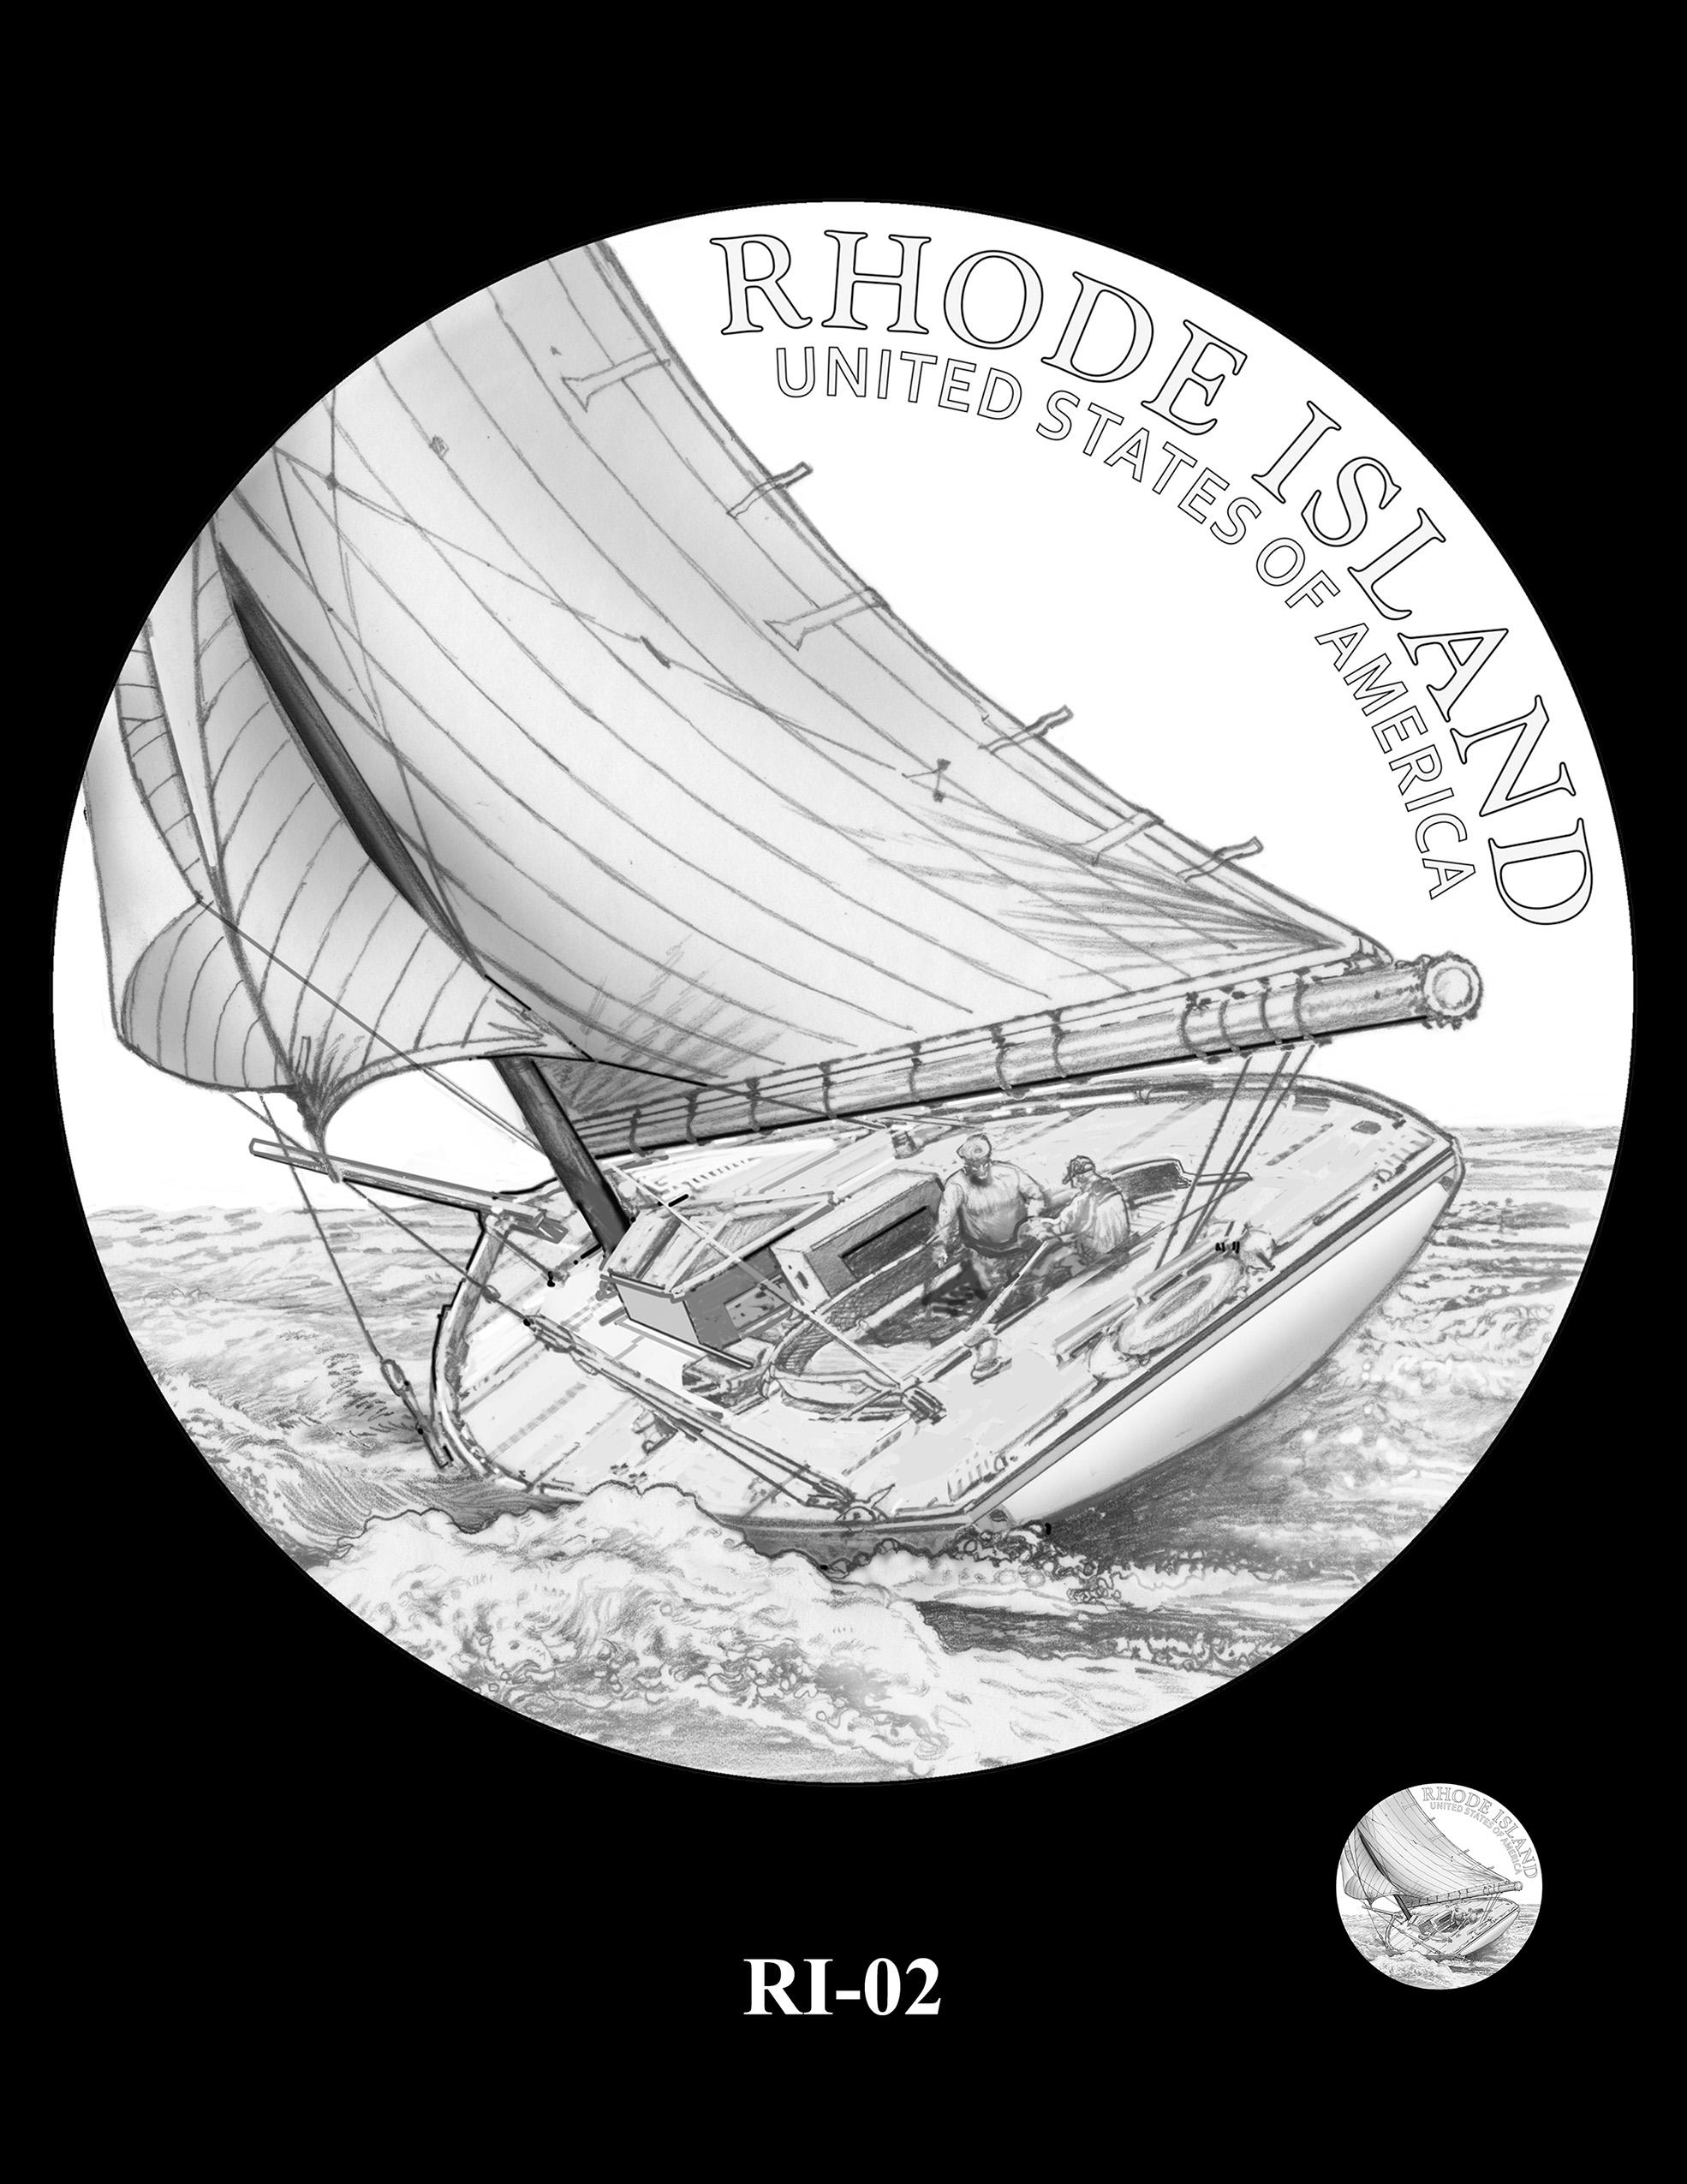 RI-02 -- 2022 American Innovation $1 Coin - Rhode Island